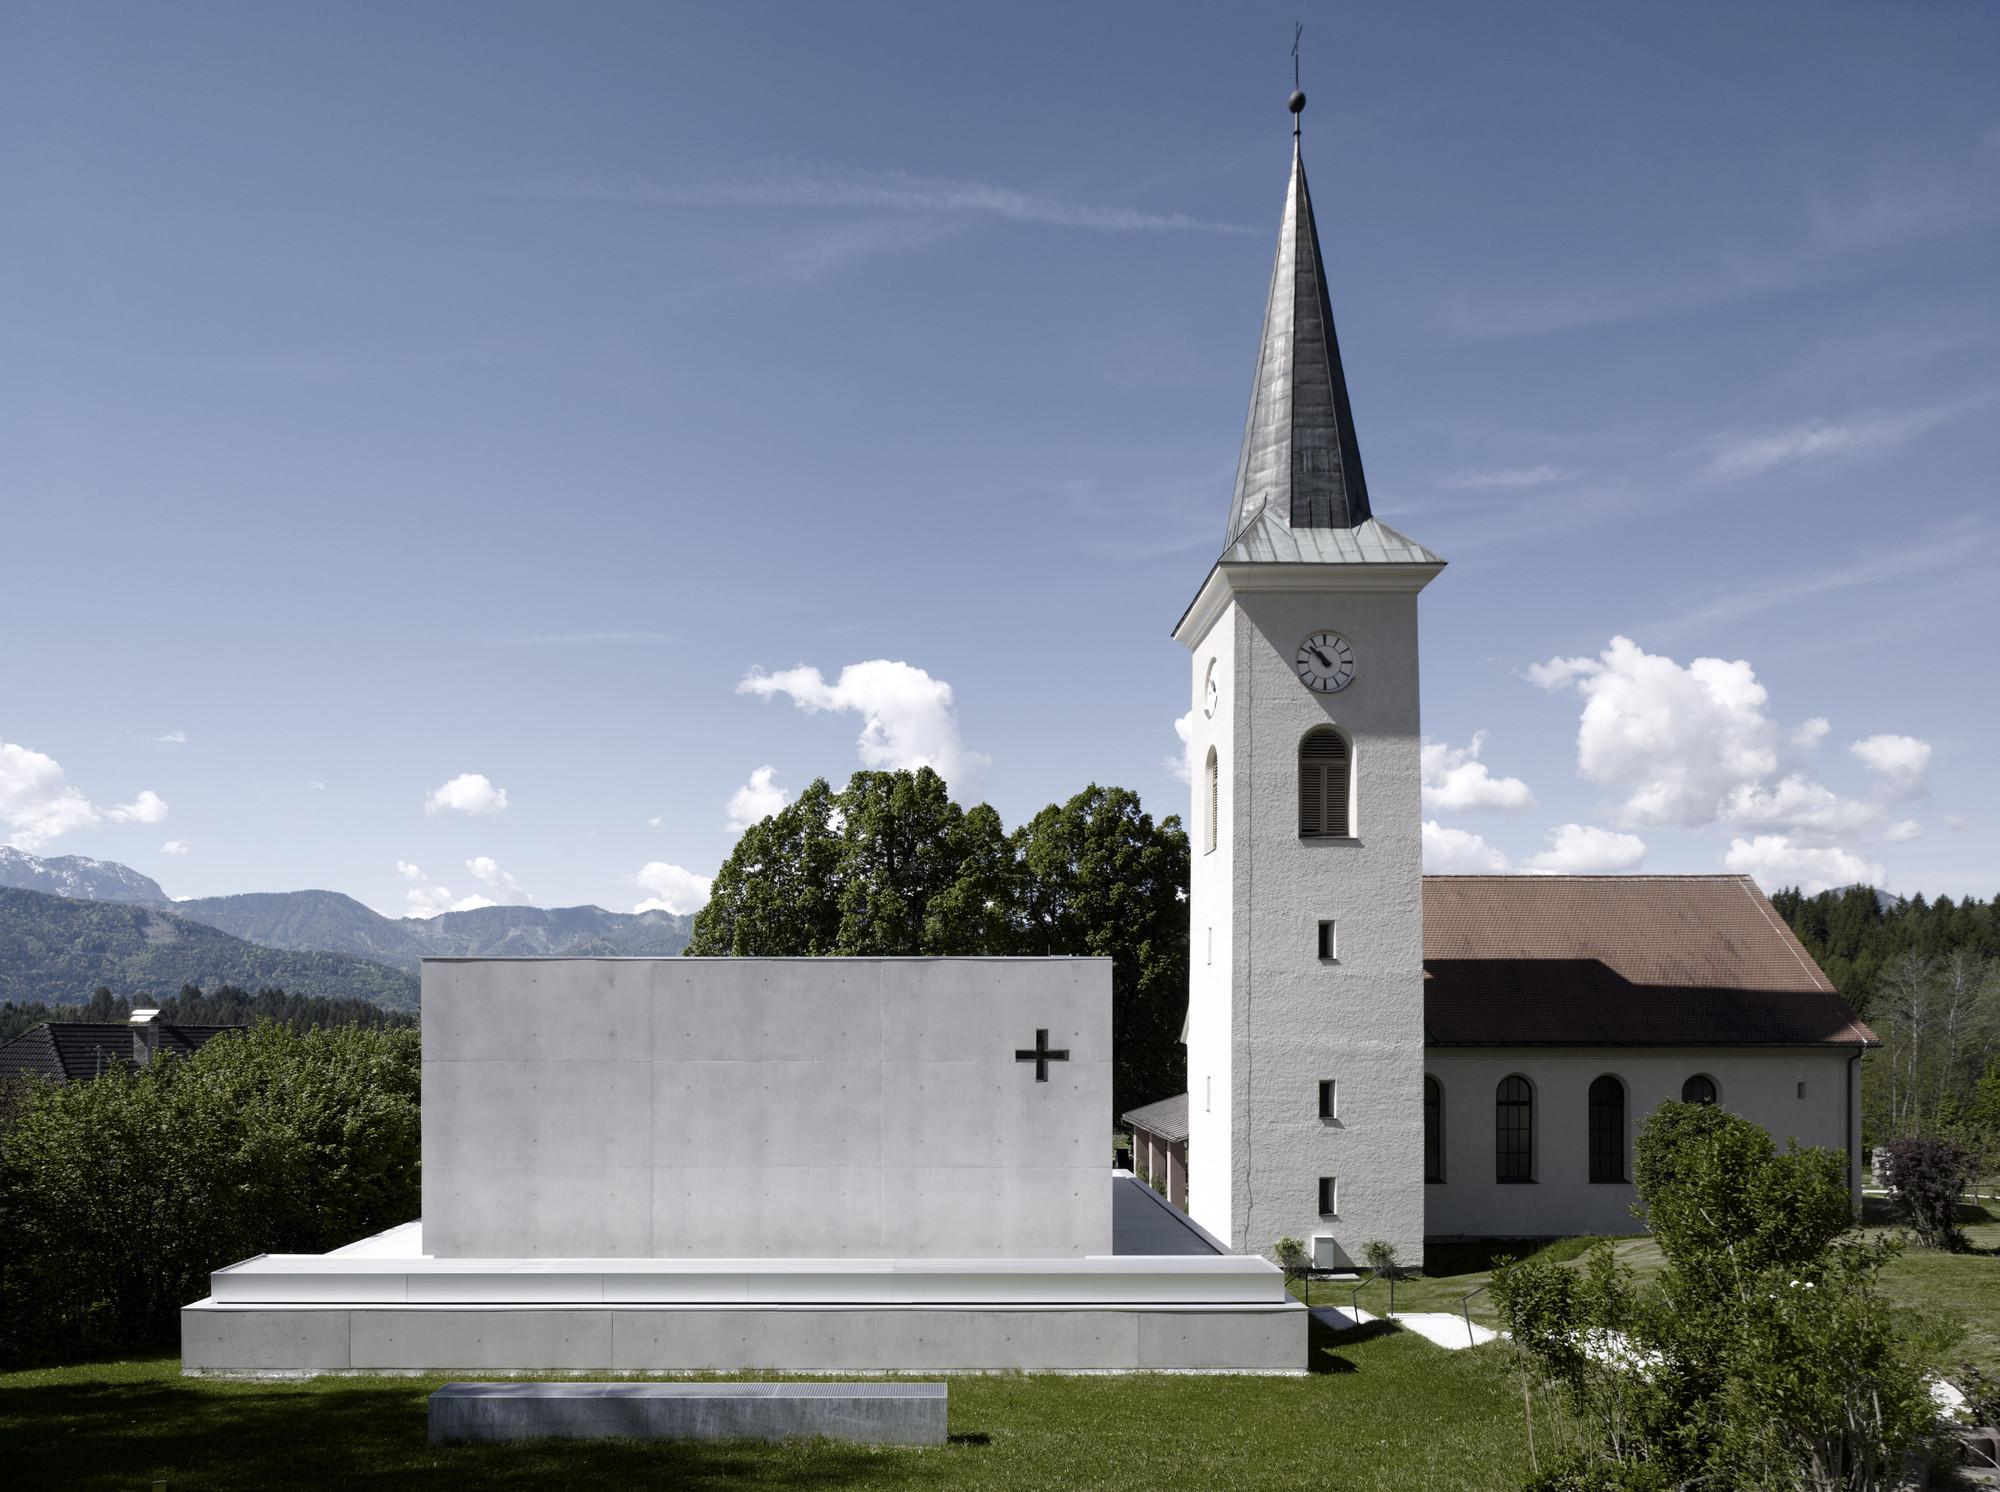 Fresach Diocesan Museum / Marte.Marte Architekten, © Marc Lins Photography